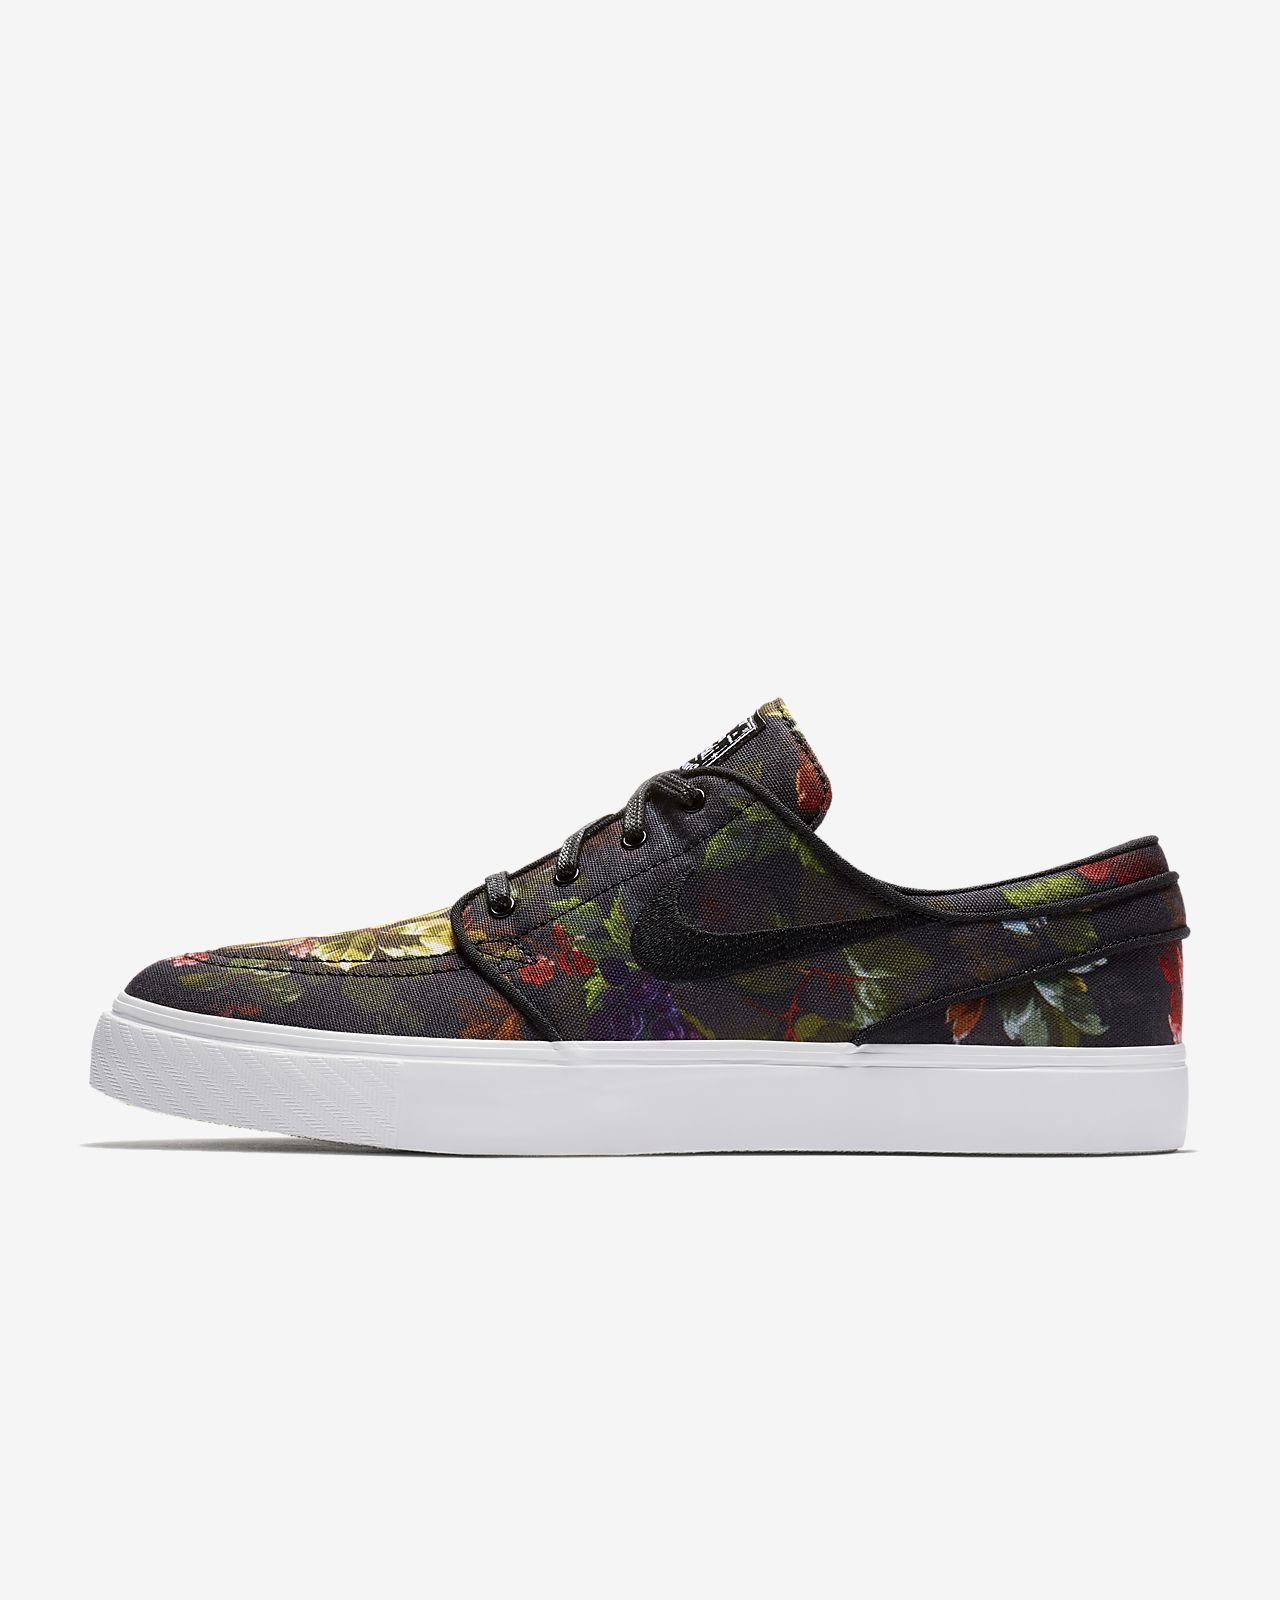 Nike SB Zoom Stefan Janoski Canvas Men's Skate Shoe